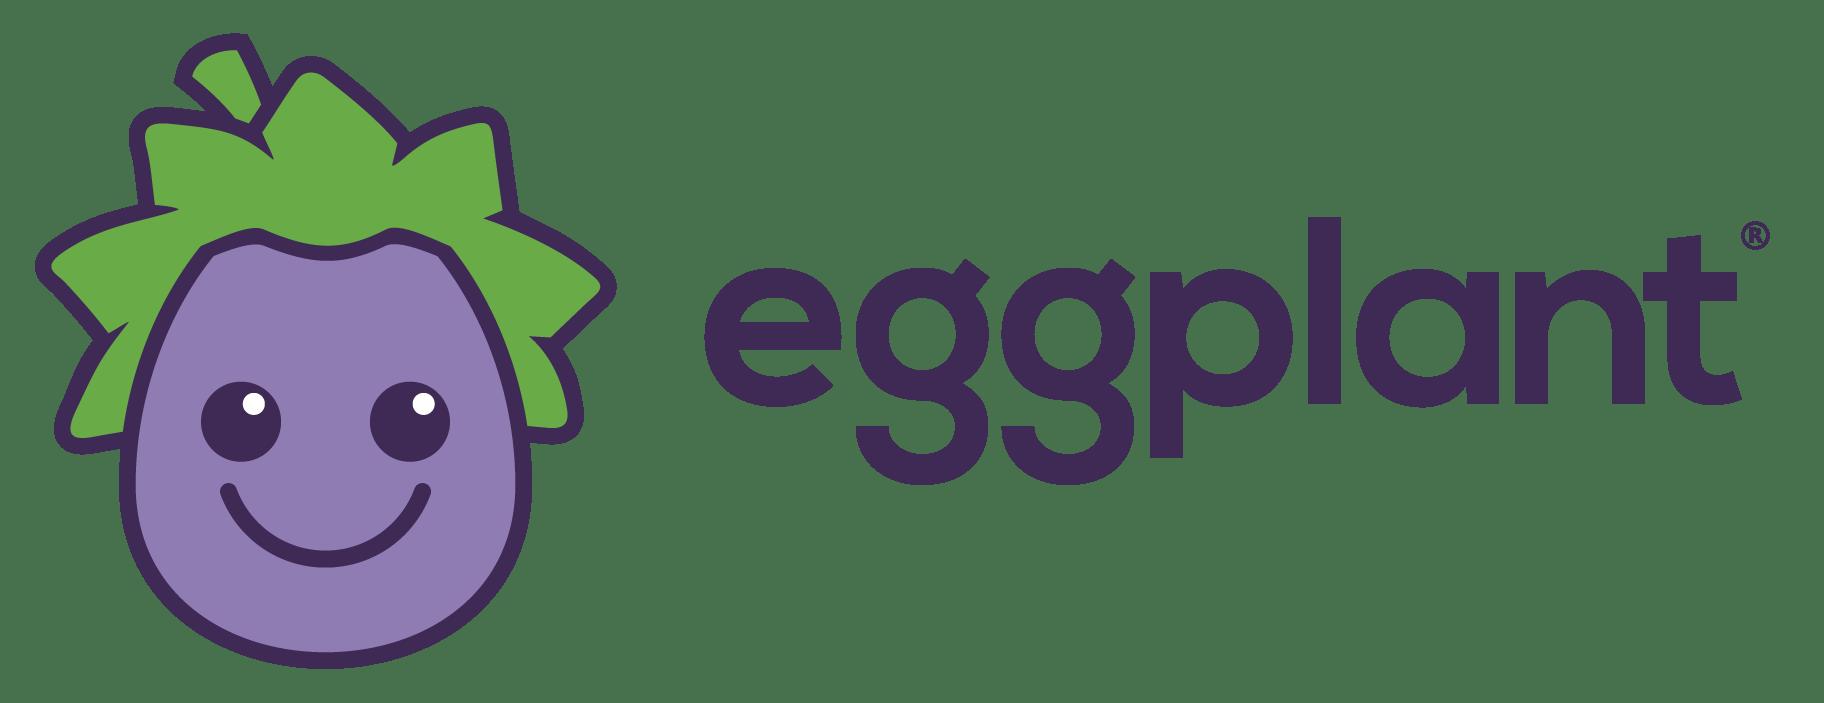 Eggplant MASTER Logo horizontal.png